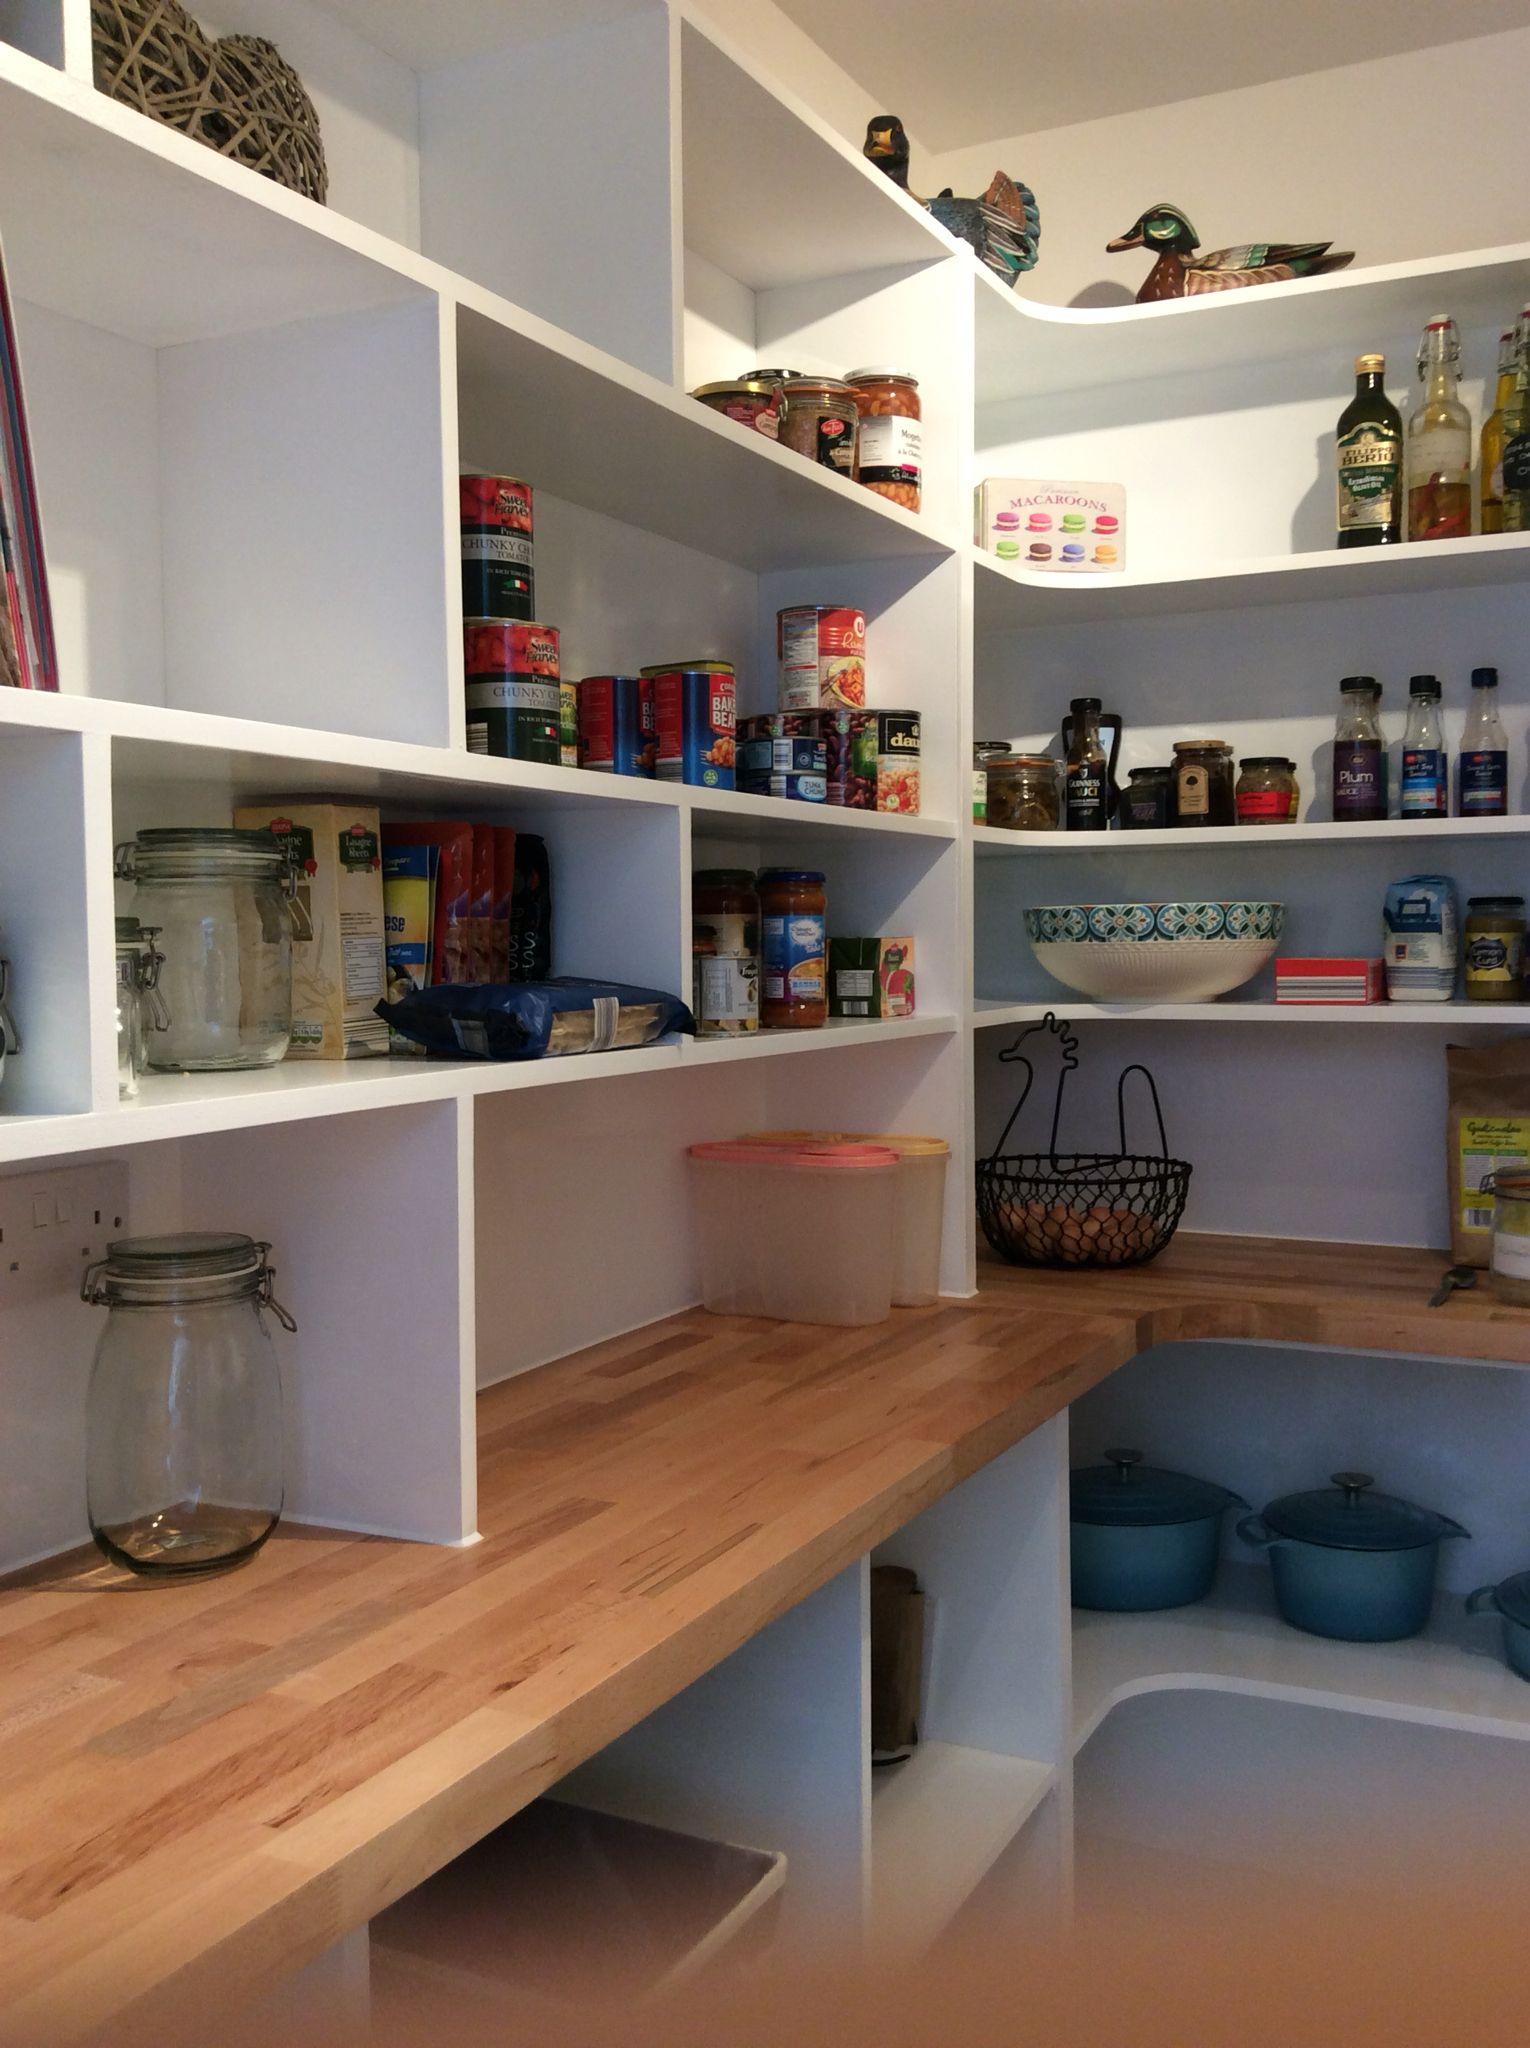 Kitchen Shelving Ideas Cabinet Doors Cheap Love My New Walk In Larder Butler Pantry Office